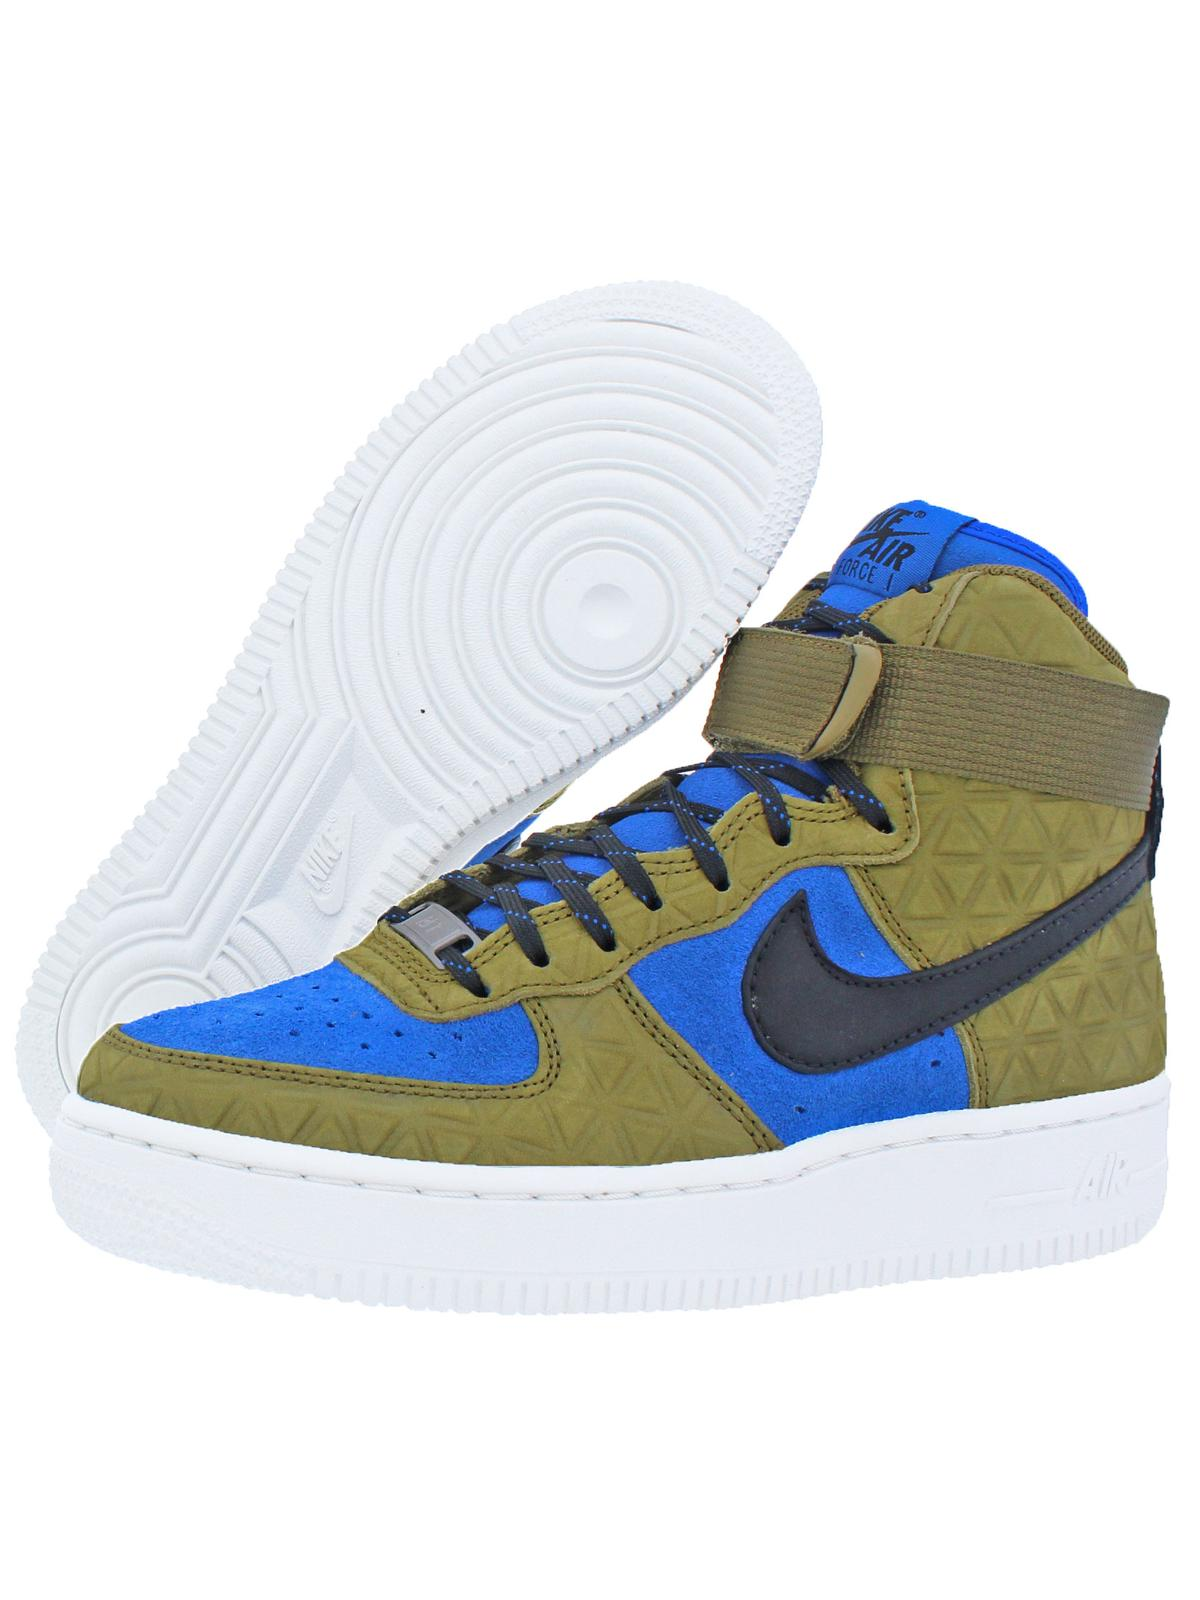 Nike Womens Air Force 1 HI Premium Suede Fashion Sneakers Green 6 Medium (B,M)